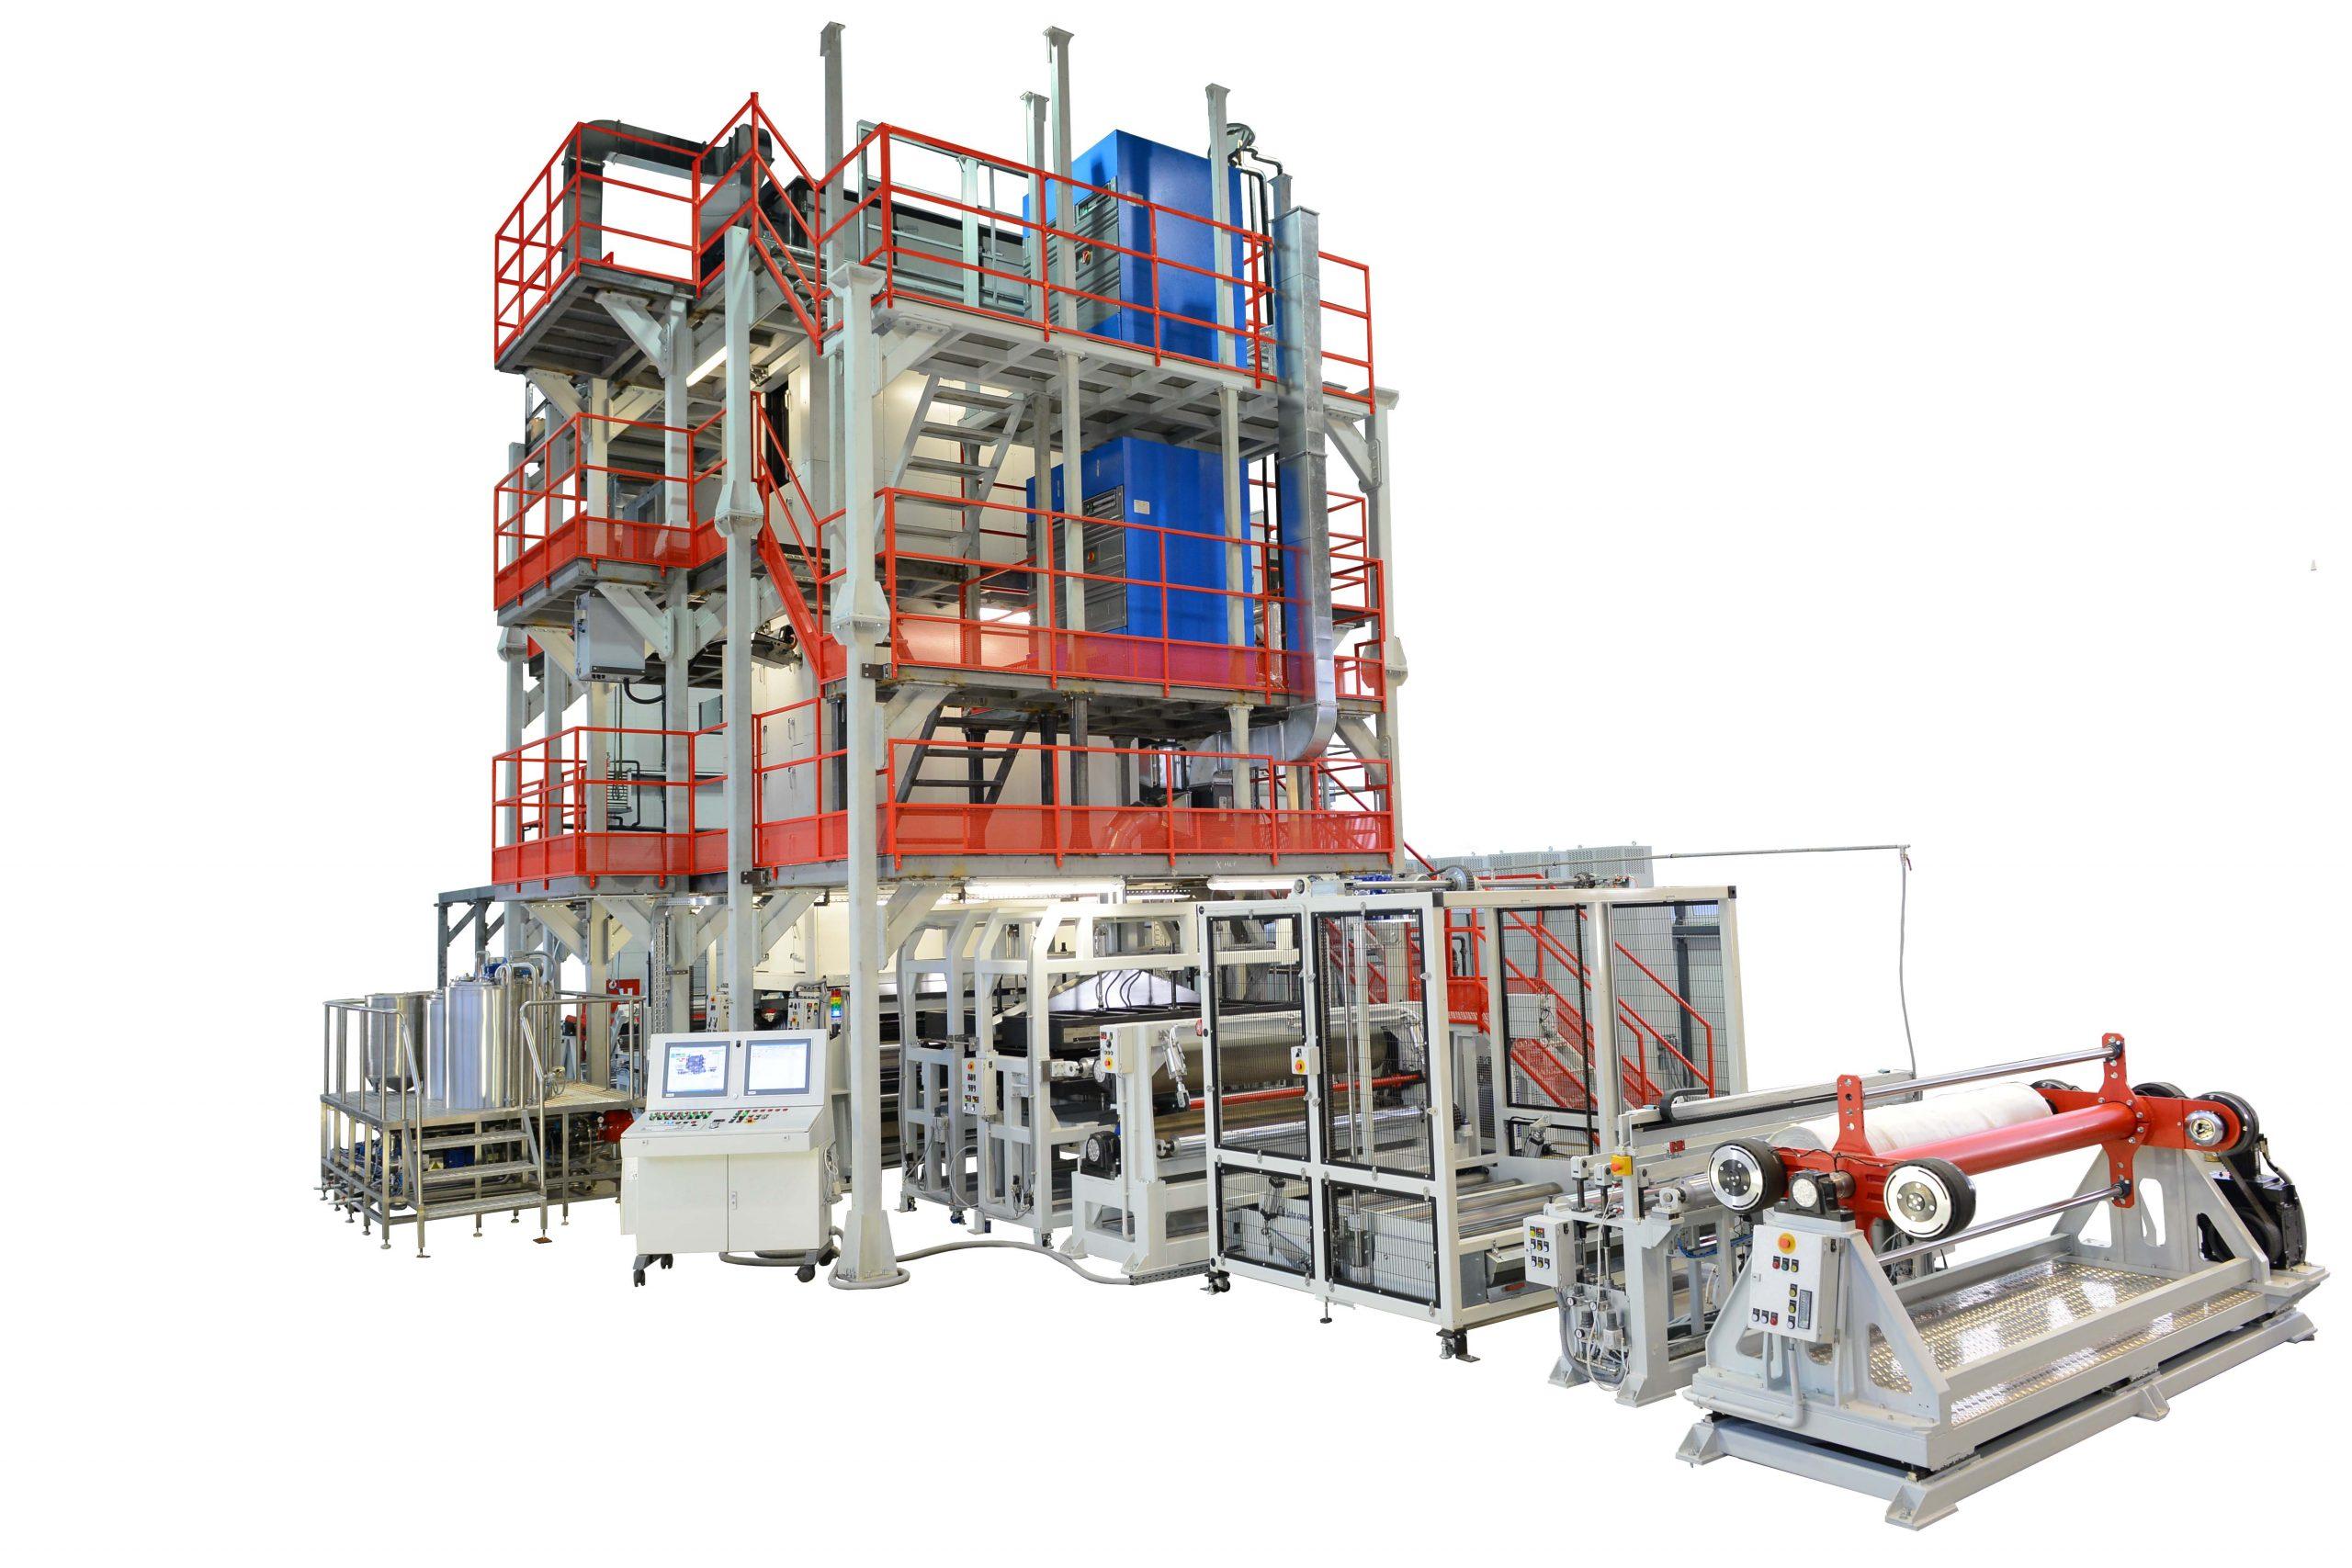 Composite Prepreg Machines